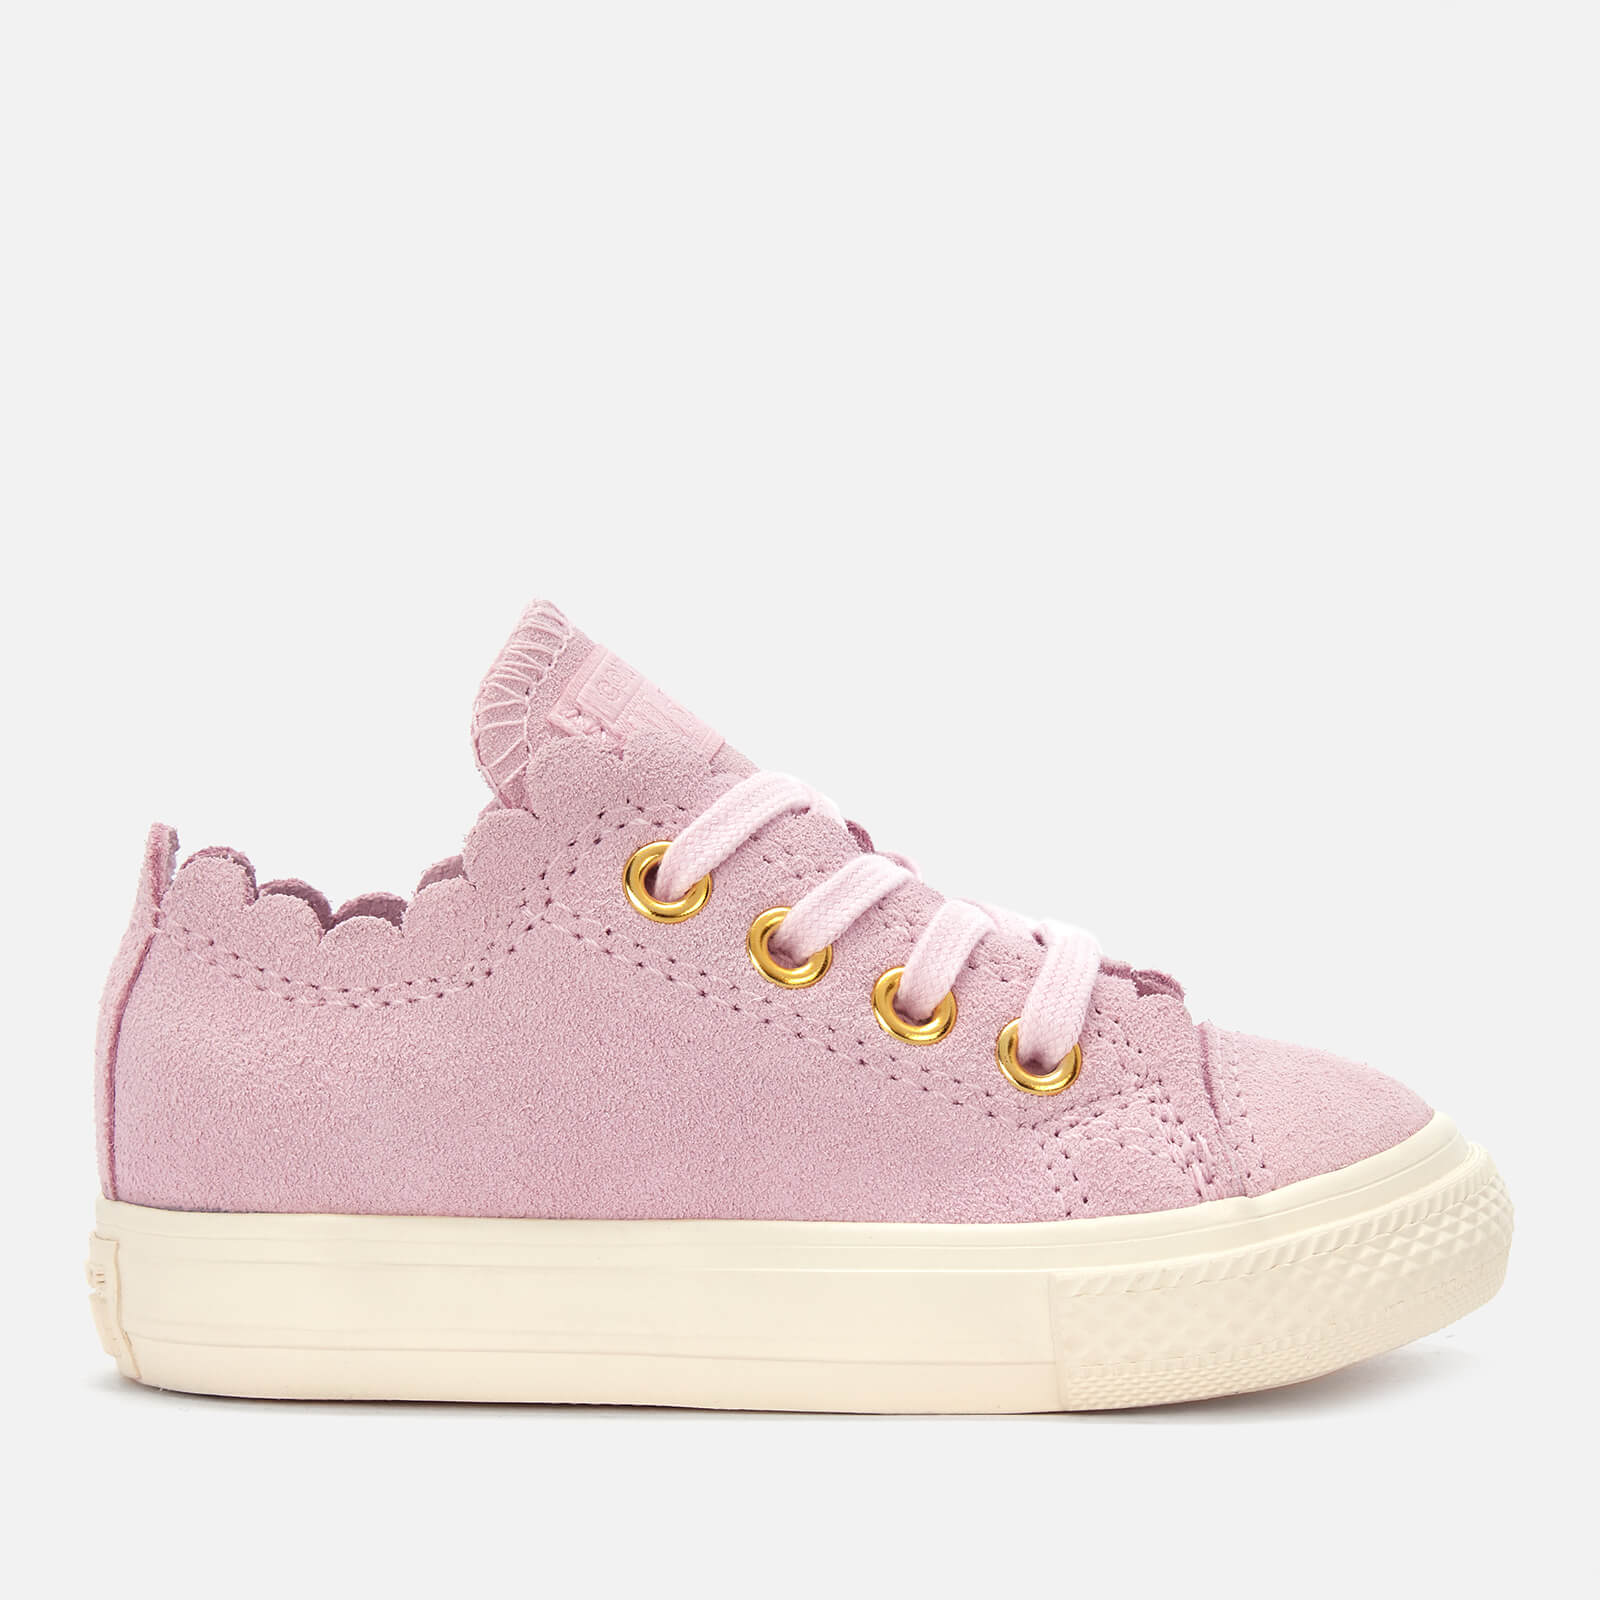 57da1faeb7c Converse Toddlers  Chuck Taylor All Star Ox Trainers - Pink Foam Brass  Junior Clothing